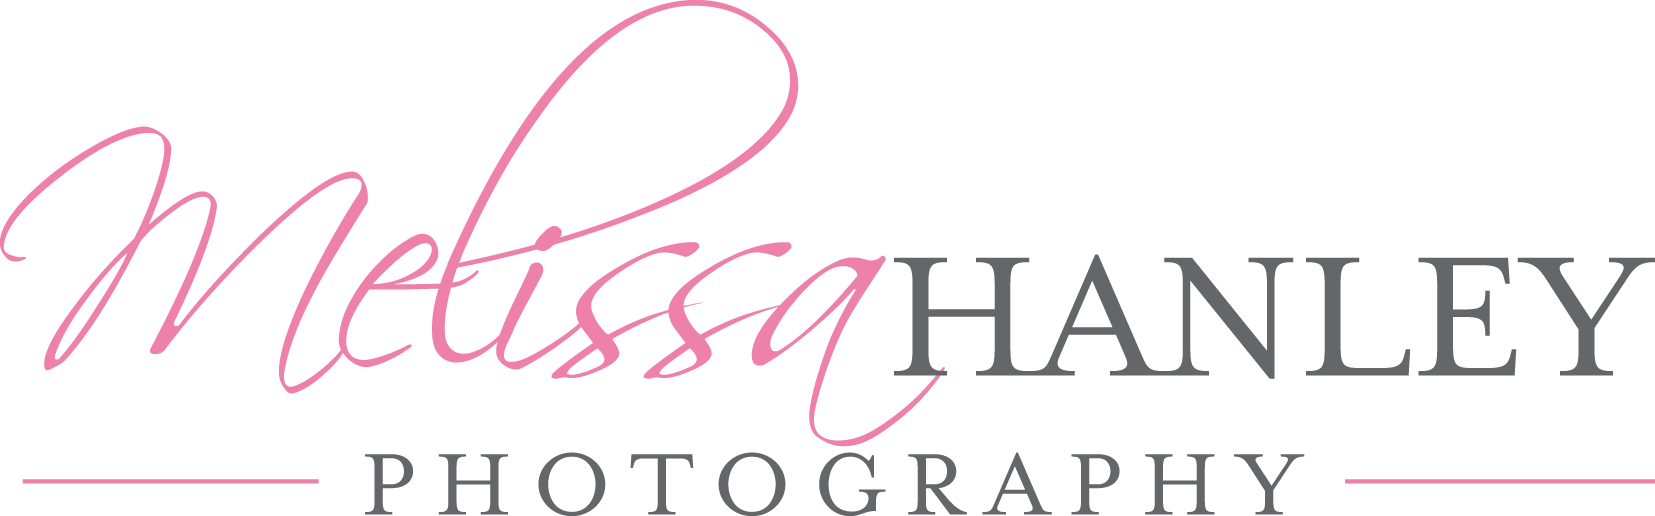 Melissa Hanley Photography